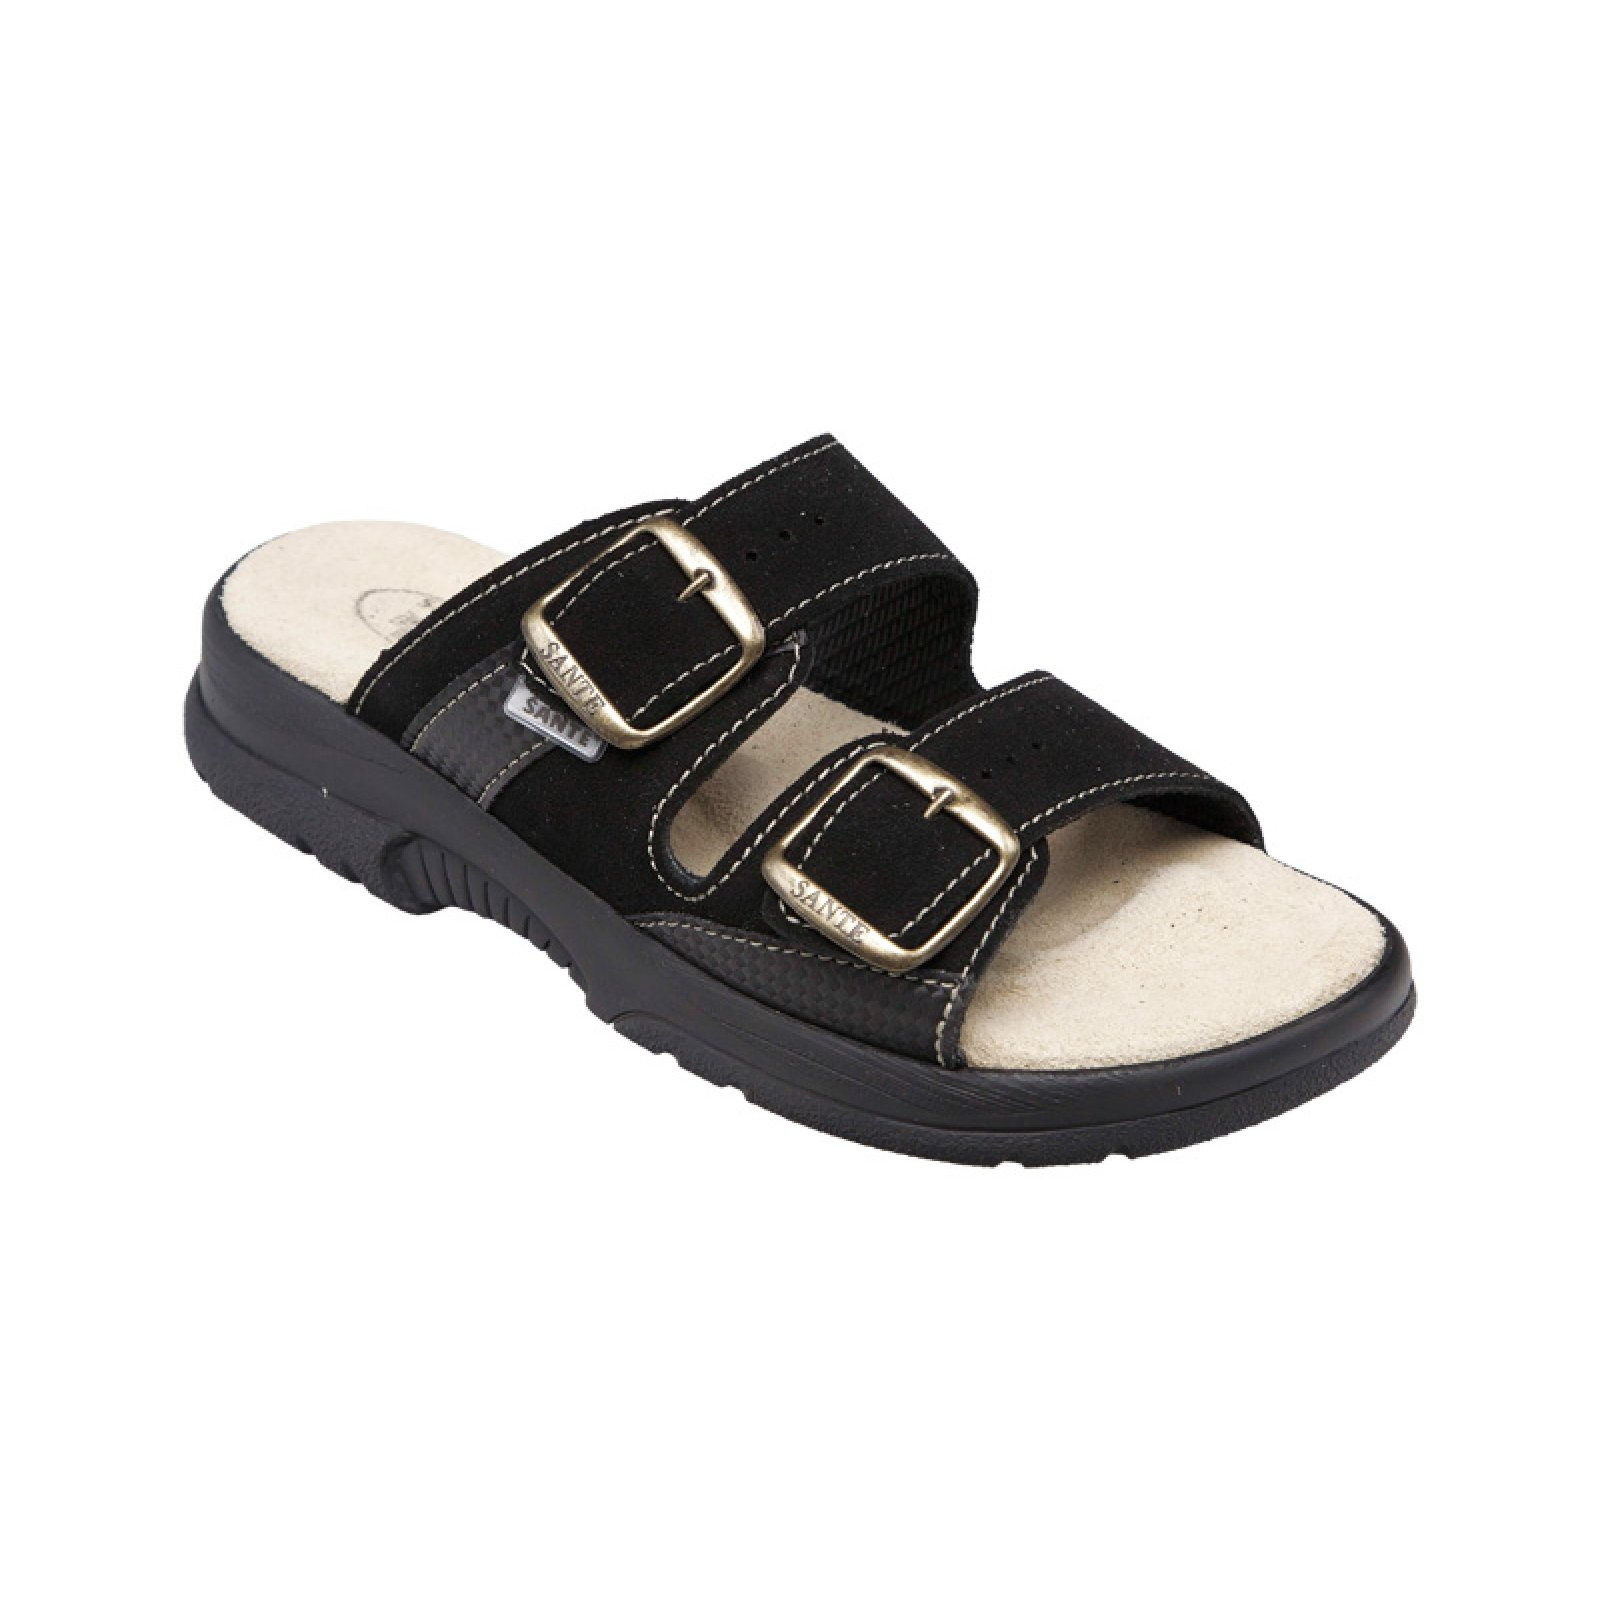 dámské pantofle Santé 517 33 68 černé - KARS c28a23f325